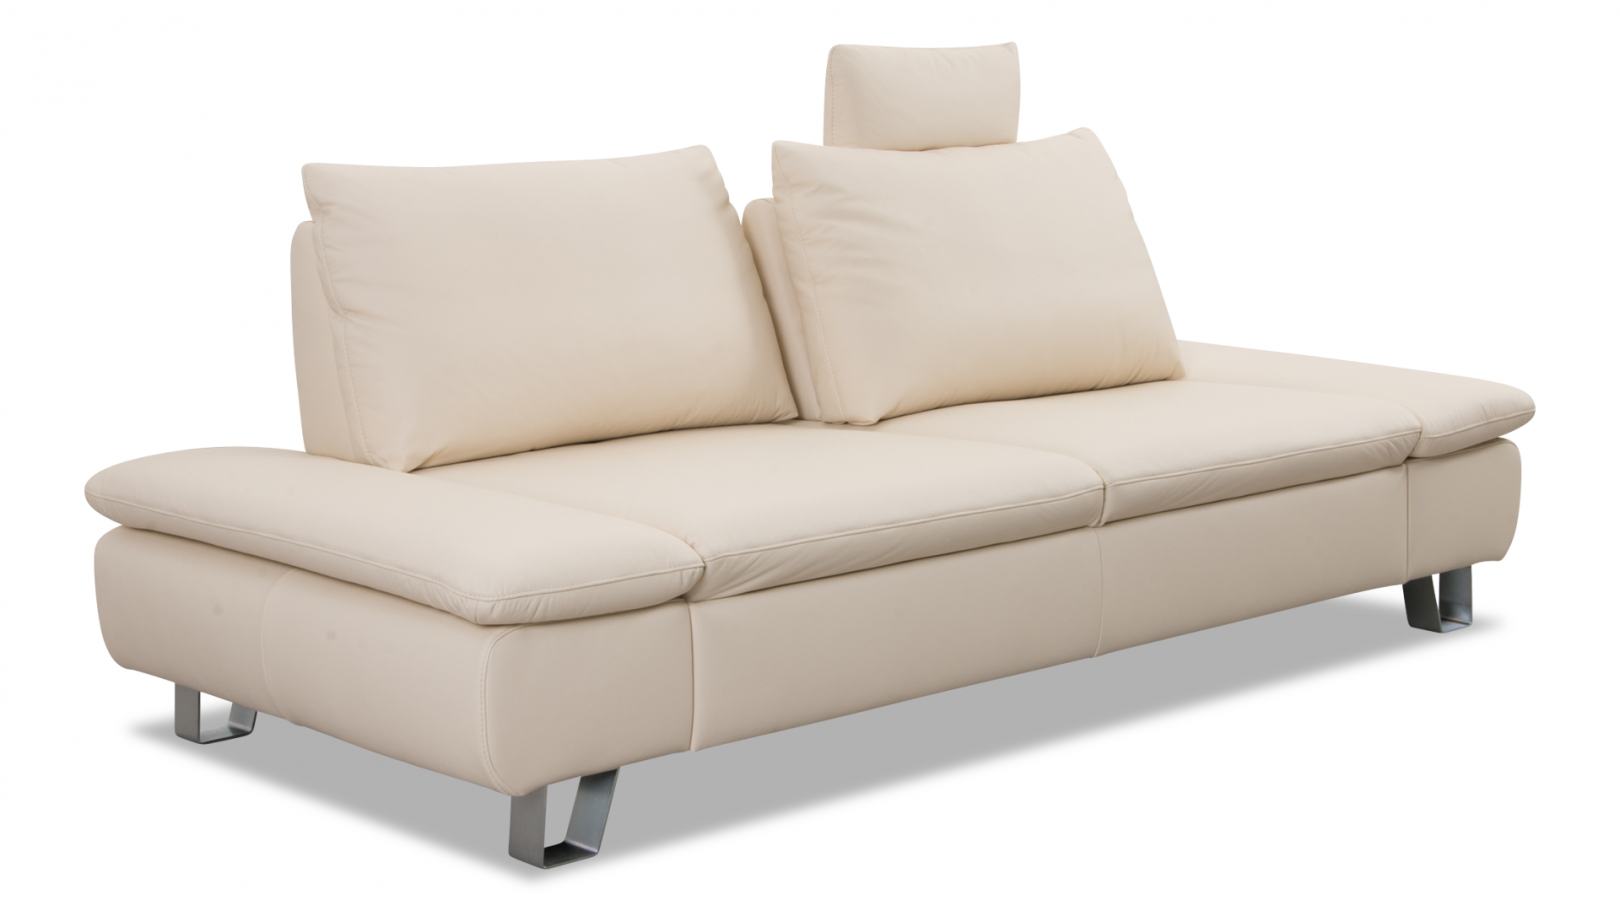 K W Himolla Sofa 7137 Love In Leder Casay Eierschale In 2020 Himolla Sofa Sofa Outlet Sitzen